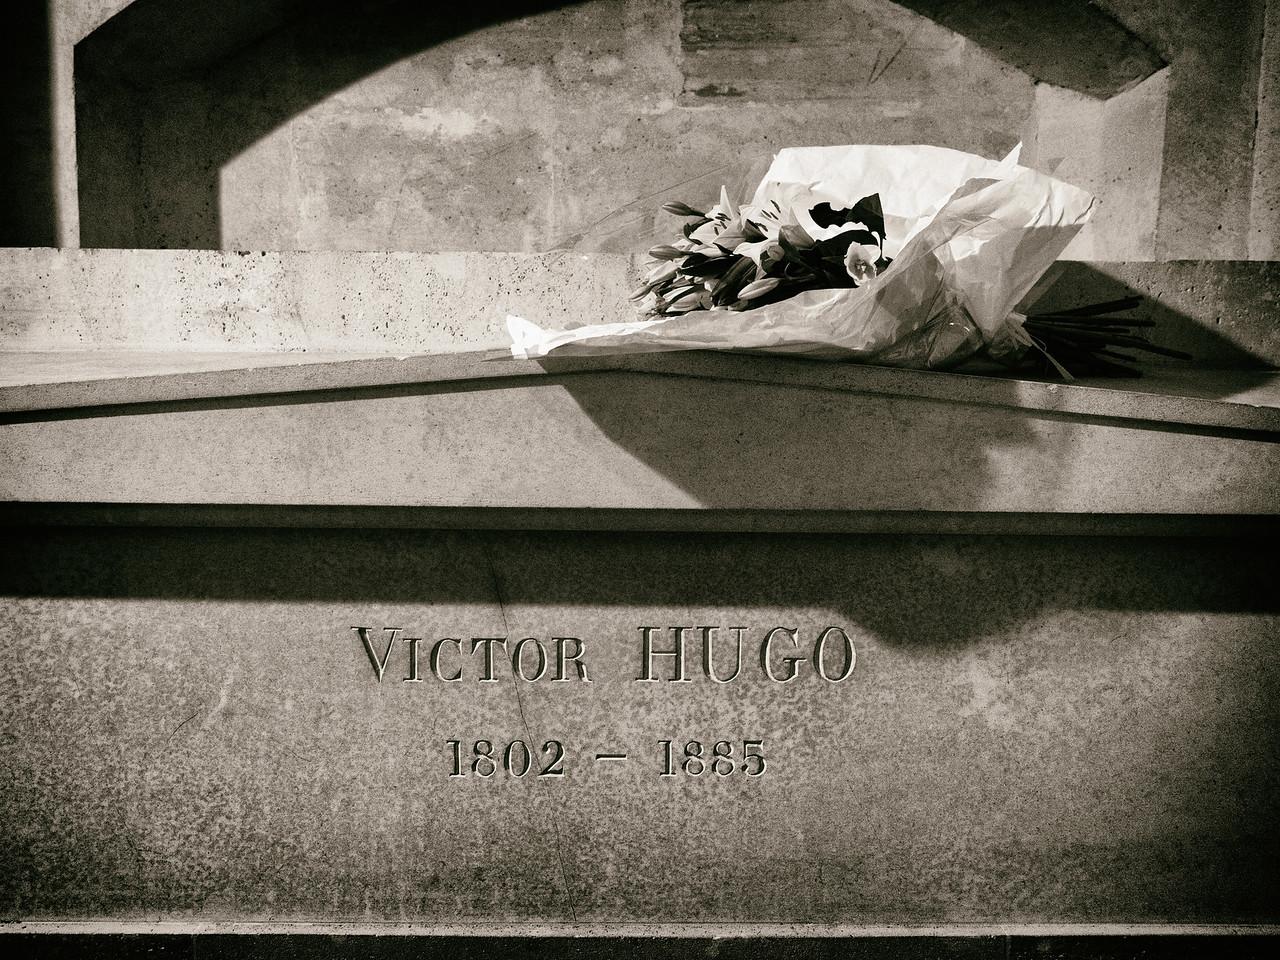 Victor Hugo's Tomb